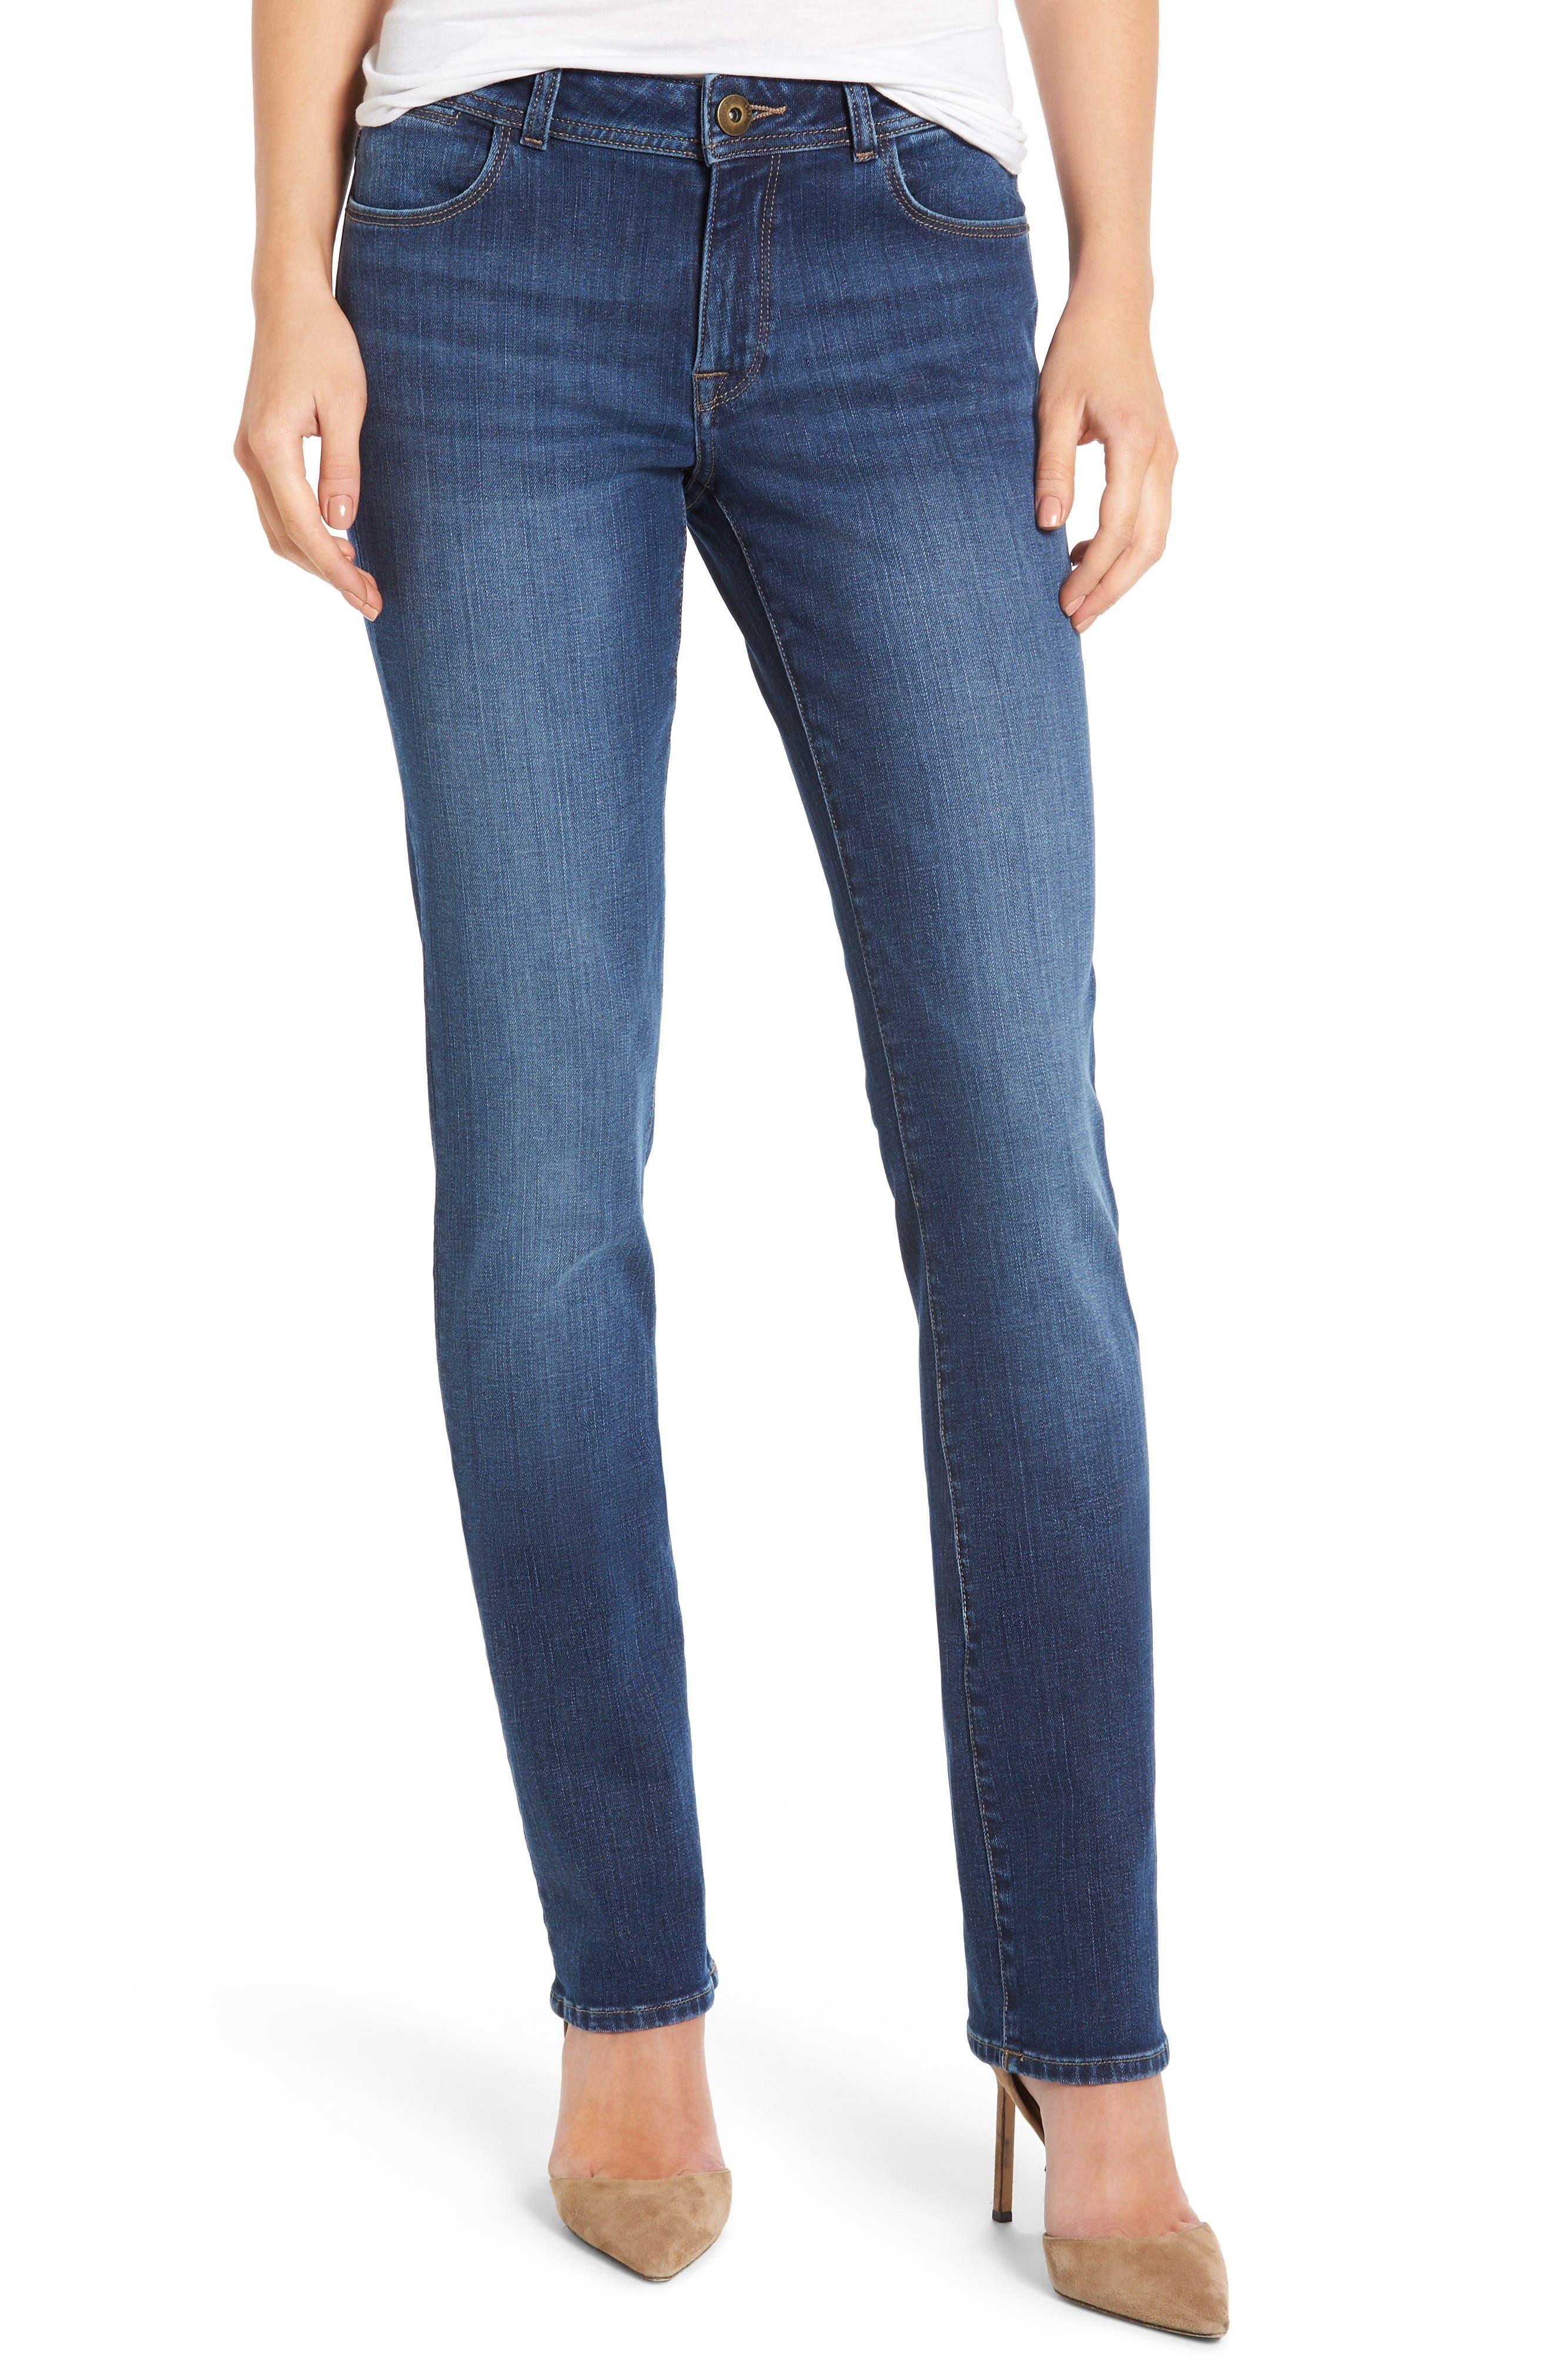 DL1961 Coco Curvy Straight Leg Jeans